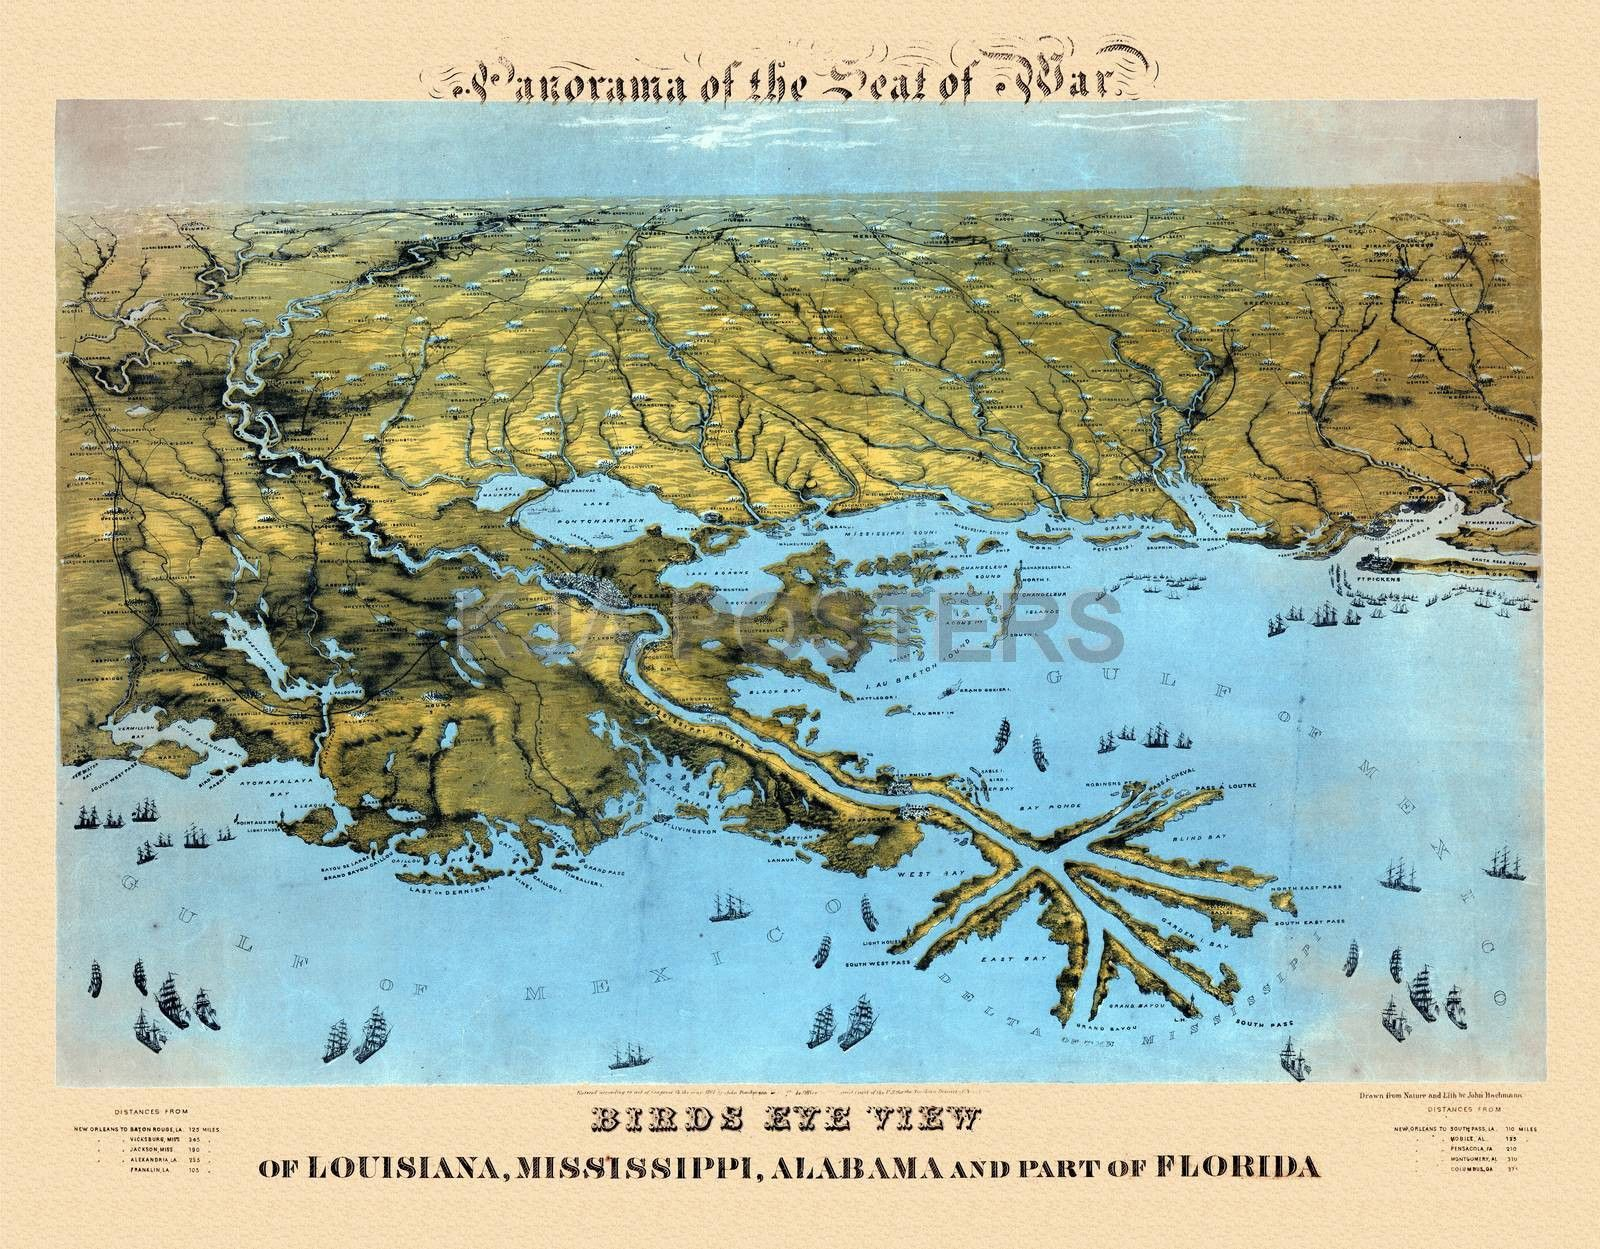 Civil war map louisiana mississippi alabama civil war pinterest civil war map louisiana mississippi alabama fandeluxe Images